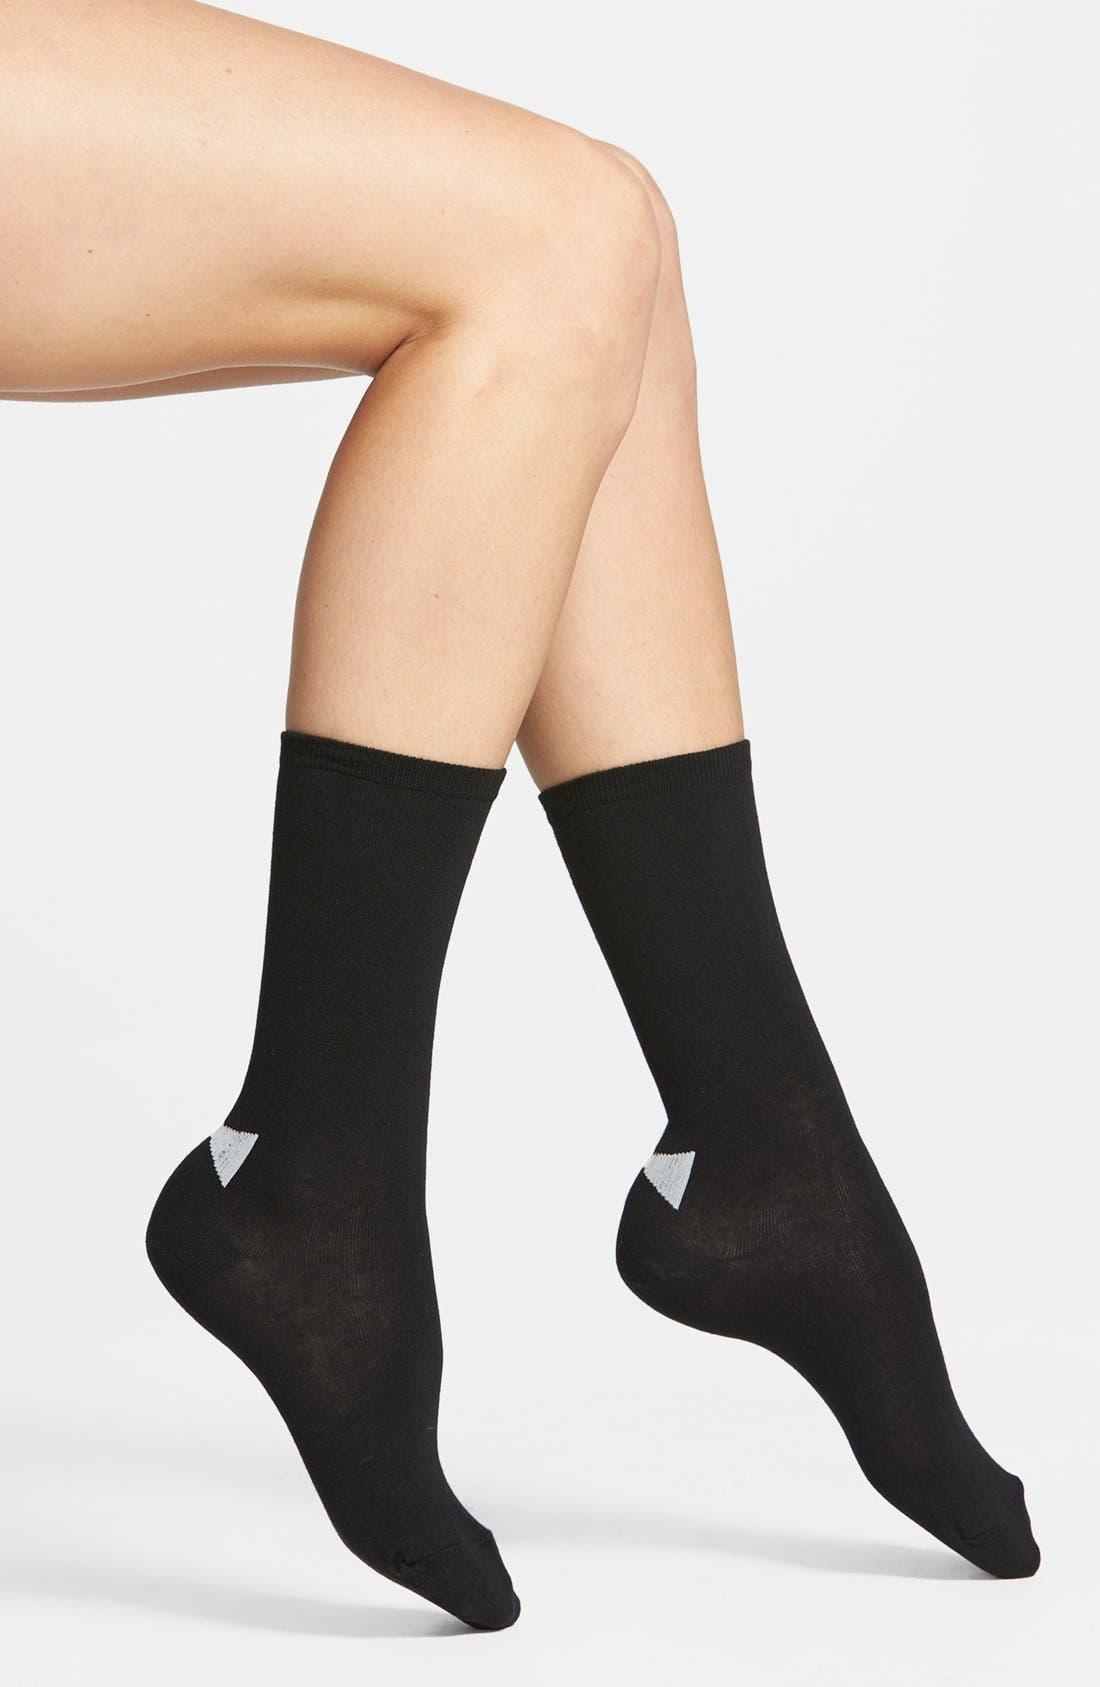 Main Image - kate spade new york 'bow' crew socks